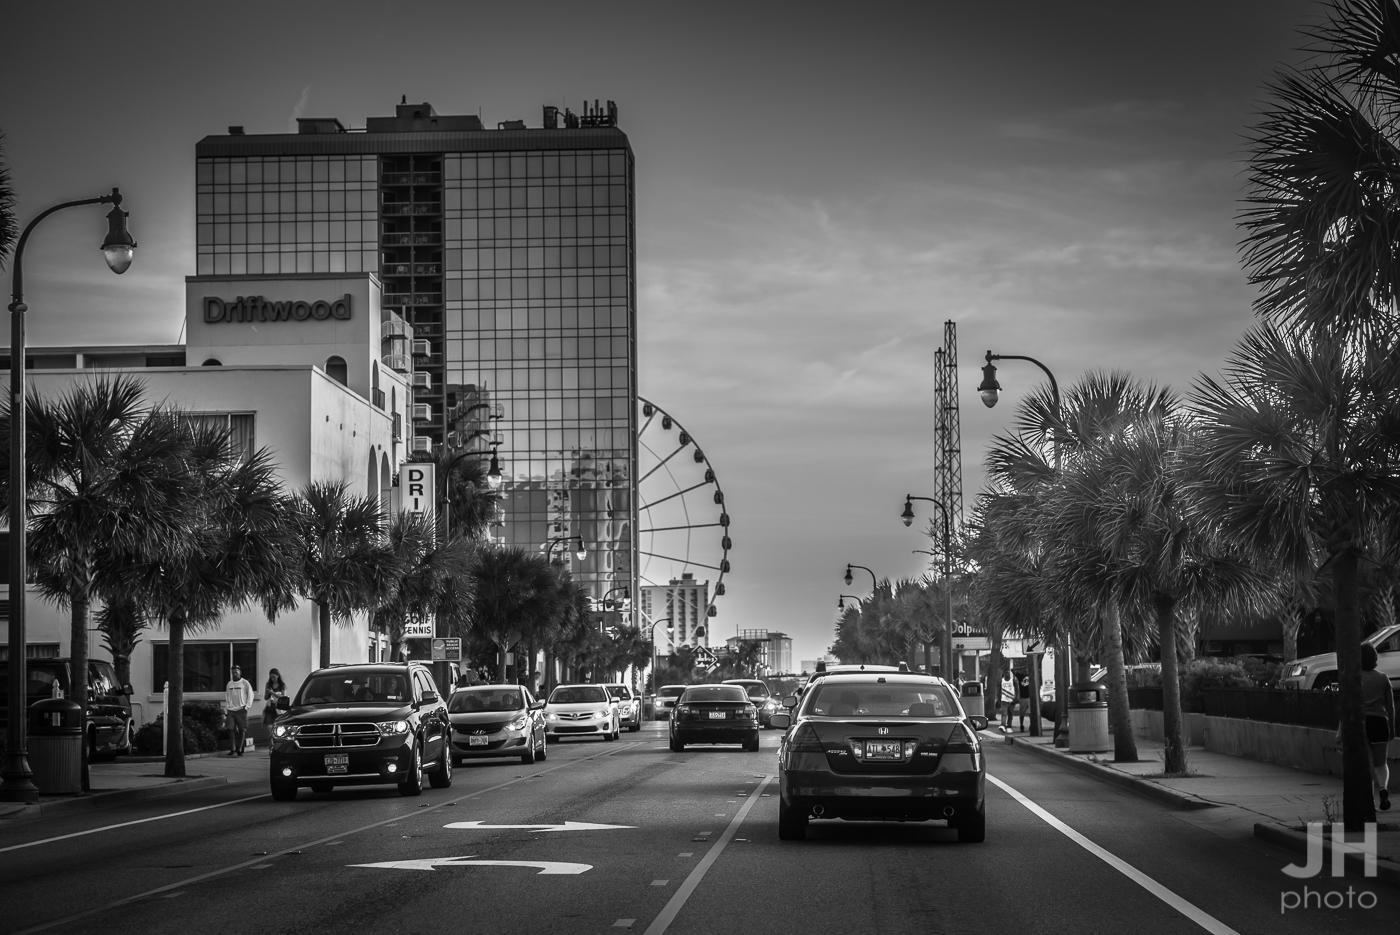 Ocean Boulevard in Myrtle Beach, South Carolina